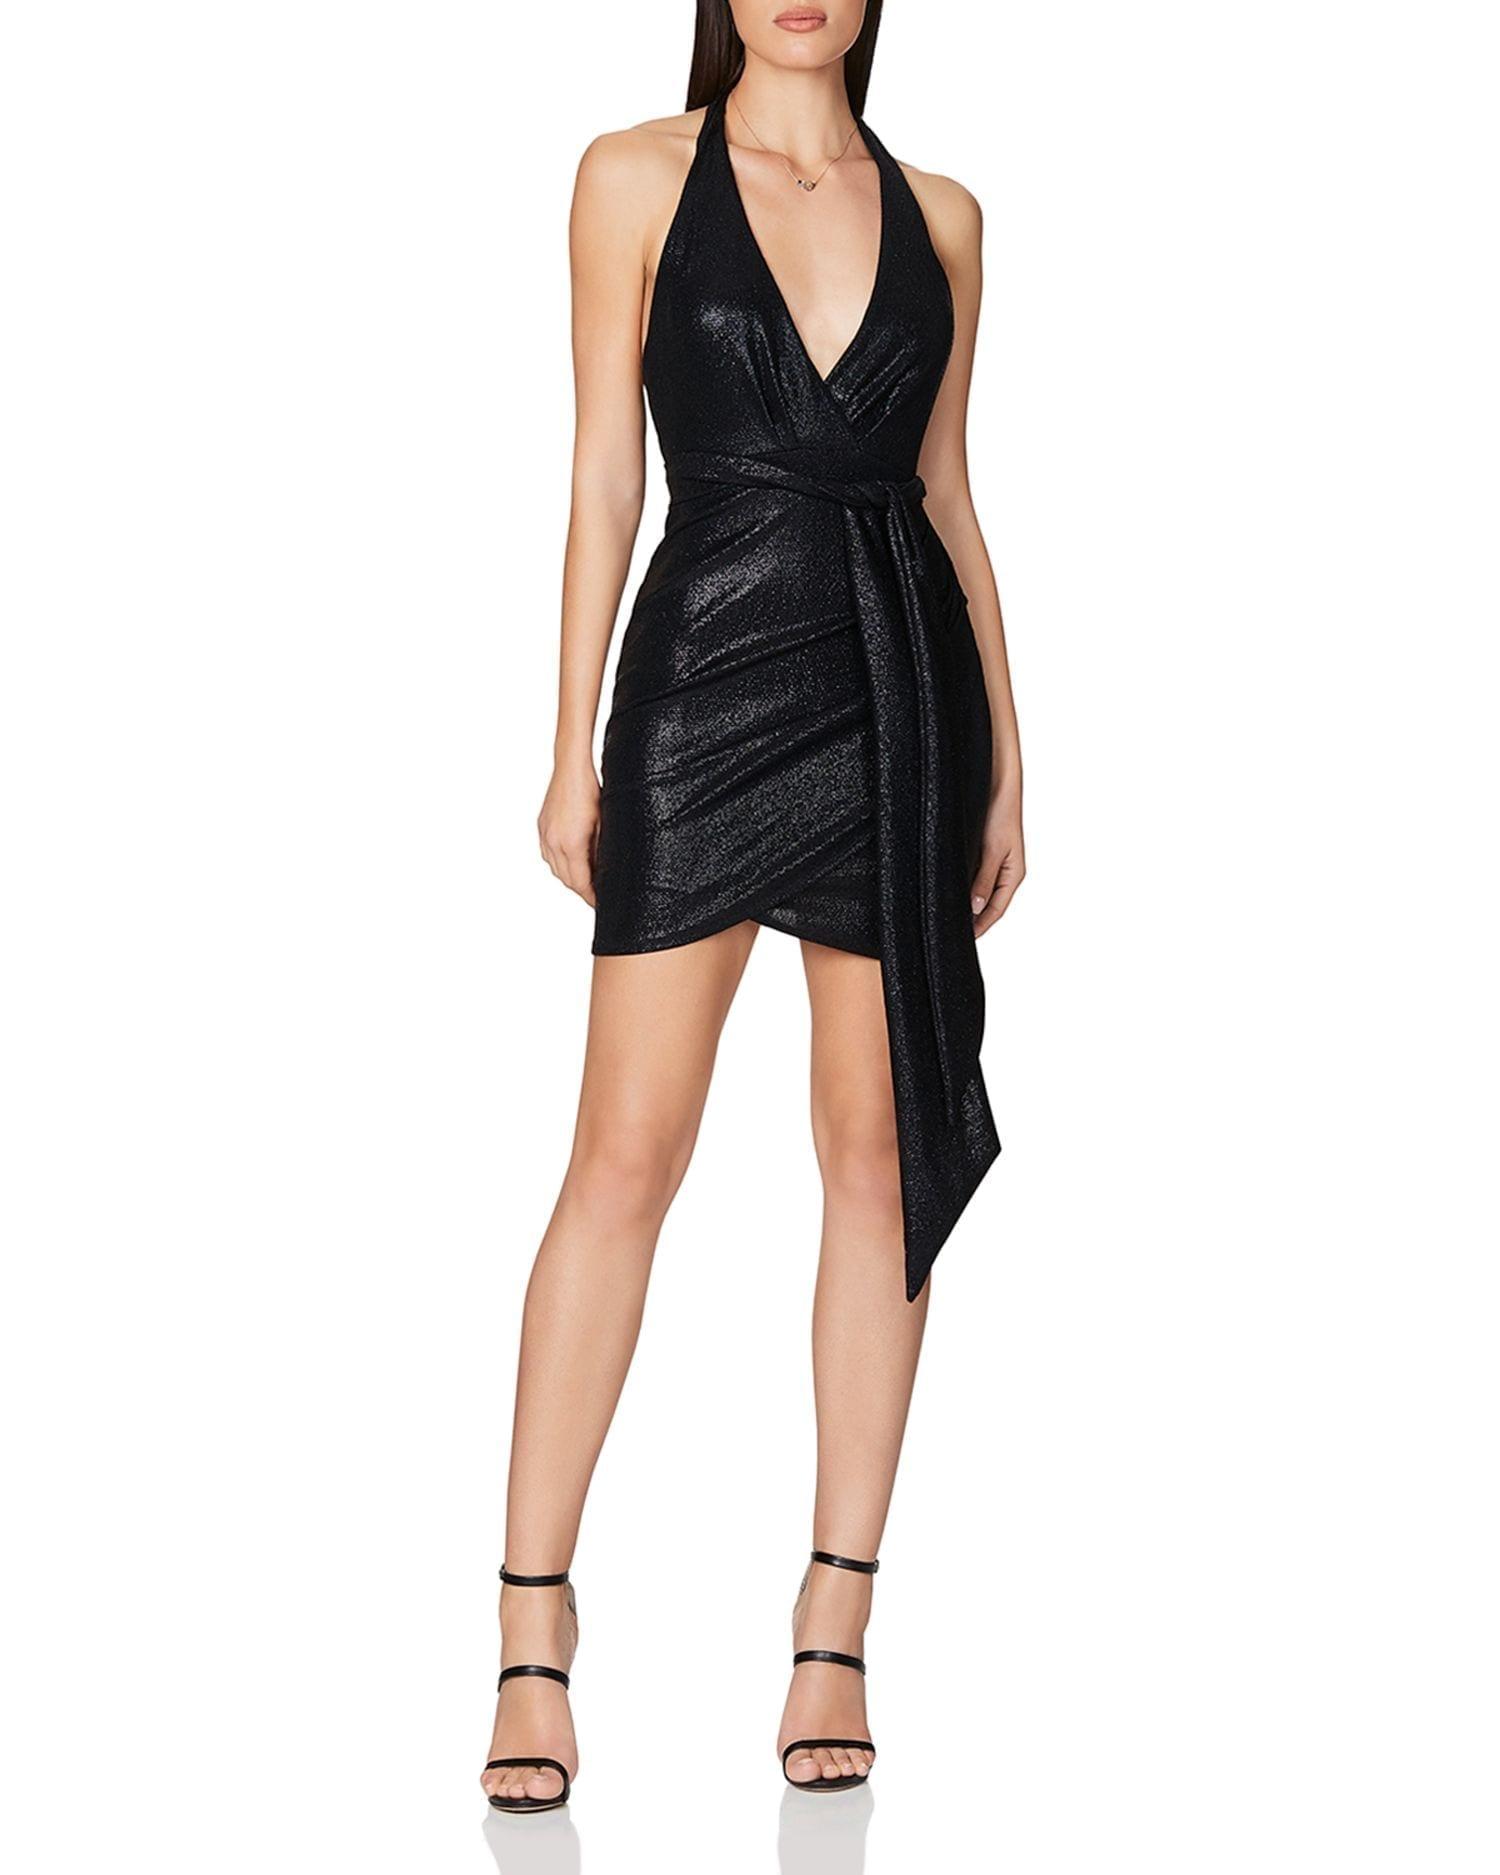 NOOKIE Bellagio Metallic Sequin Bodycon Dress